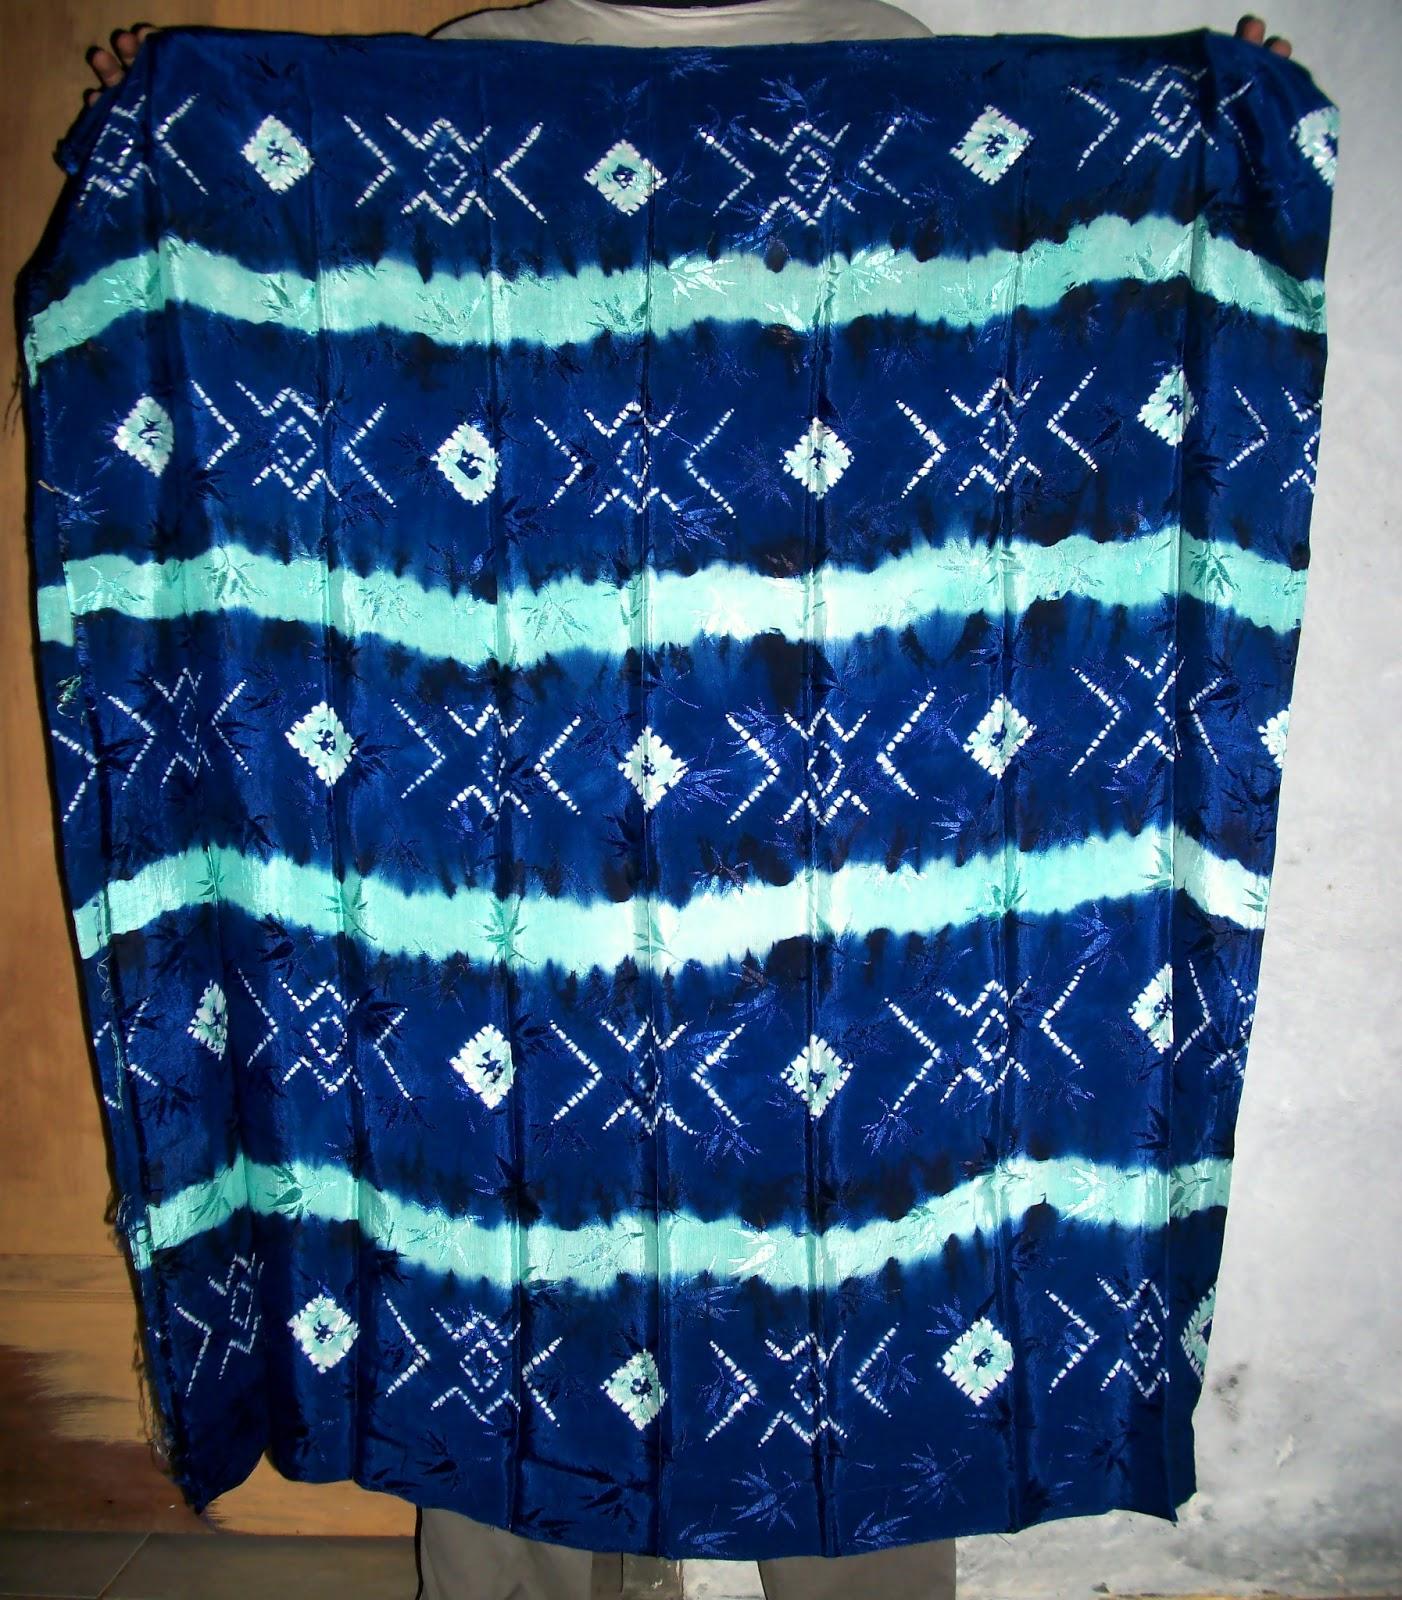 Harga kain Sasirangan bervariasi mulai Puluhan Ribu hingga Ratusan ...